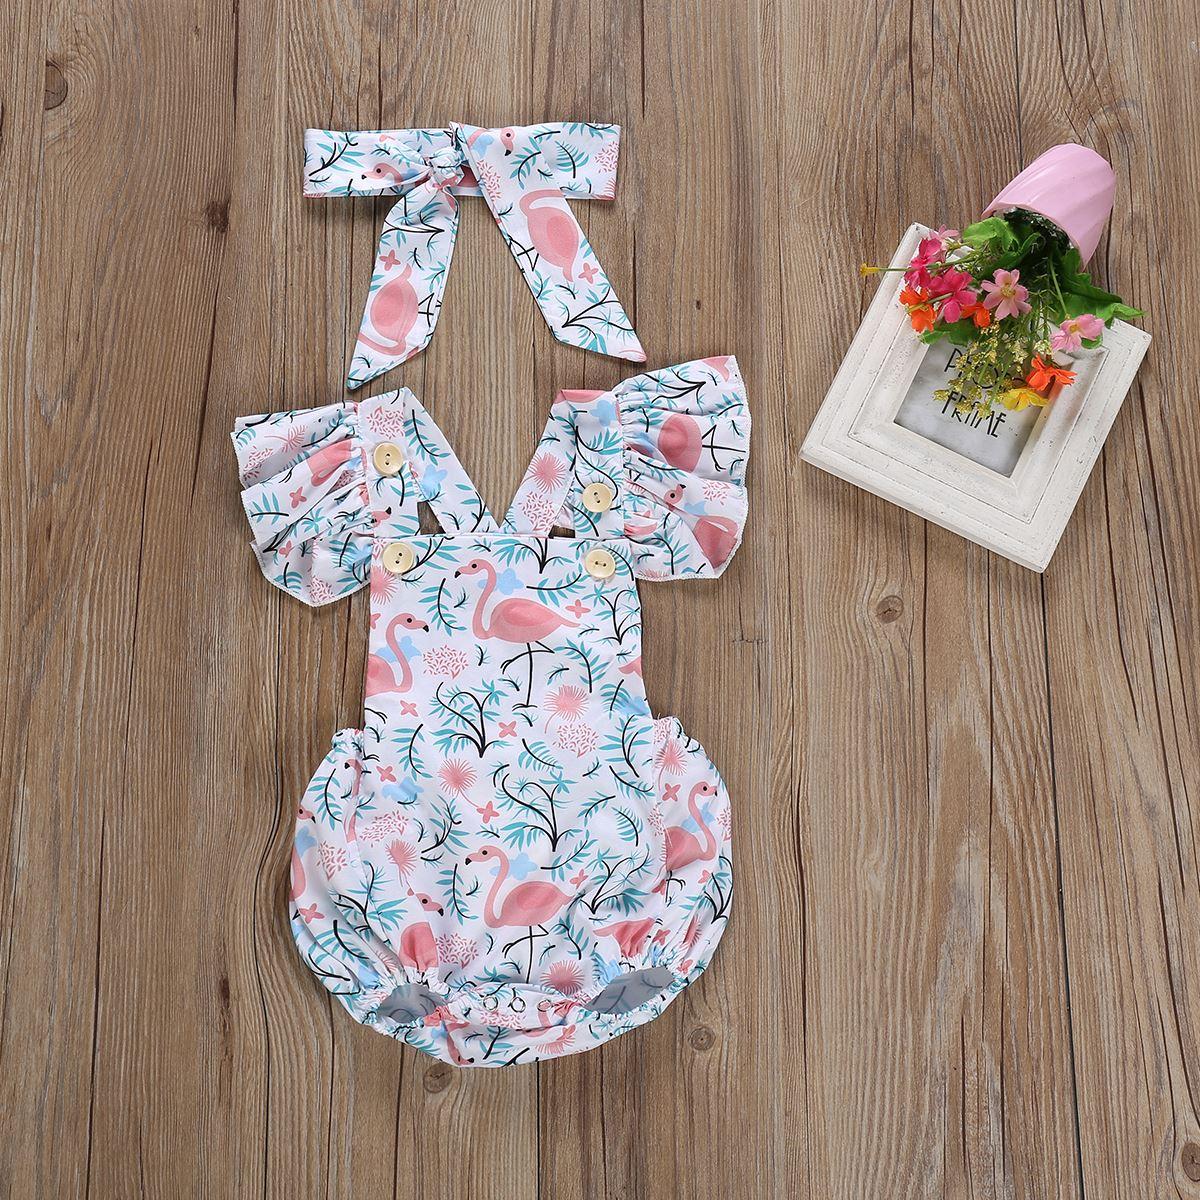 Summer New 2019 cute 2pcs/set Infant Baby Girl Floral Bird Print Outfits Clothes Set Romper + Headband 0-24M